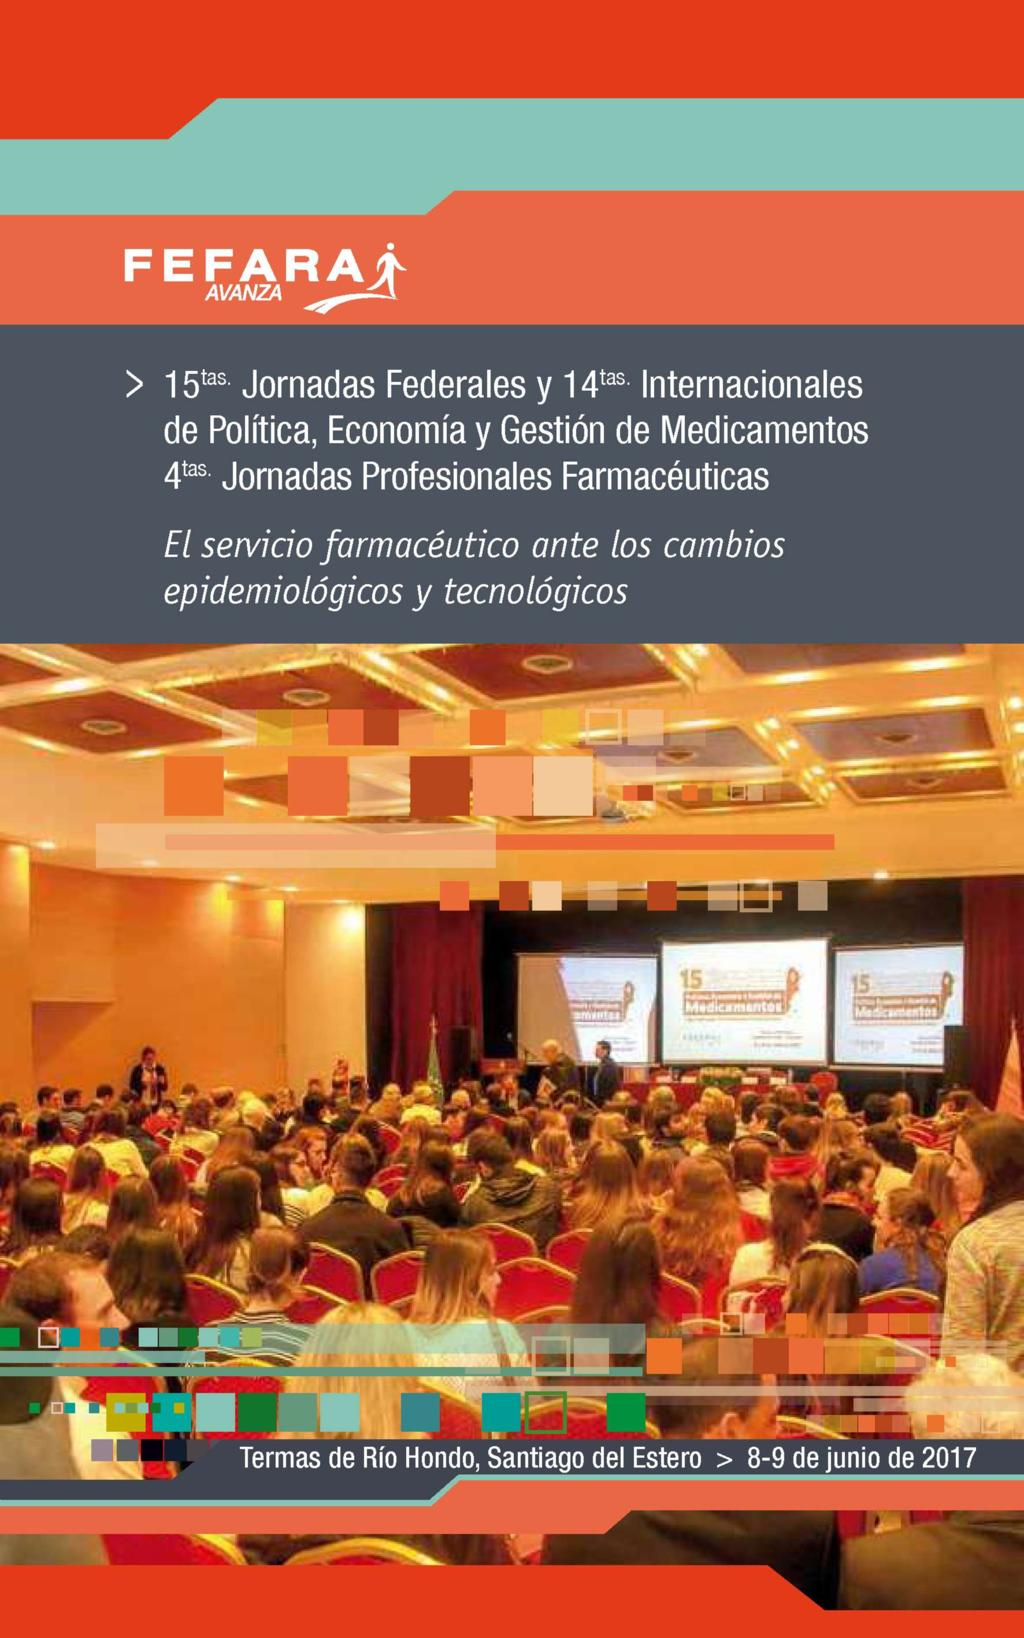 Jornadas 2017 Image